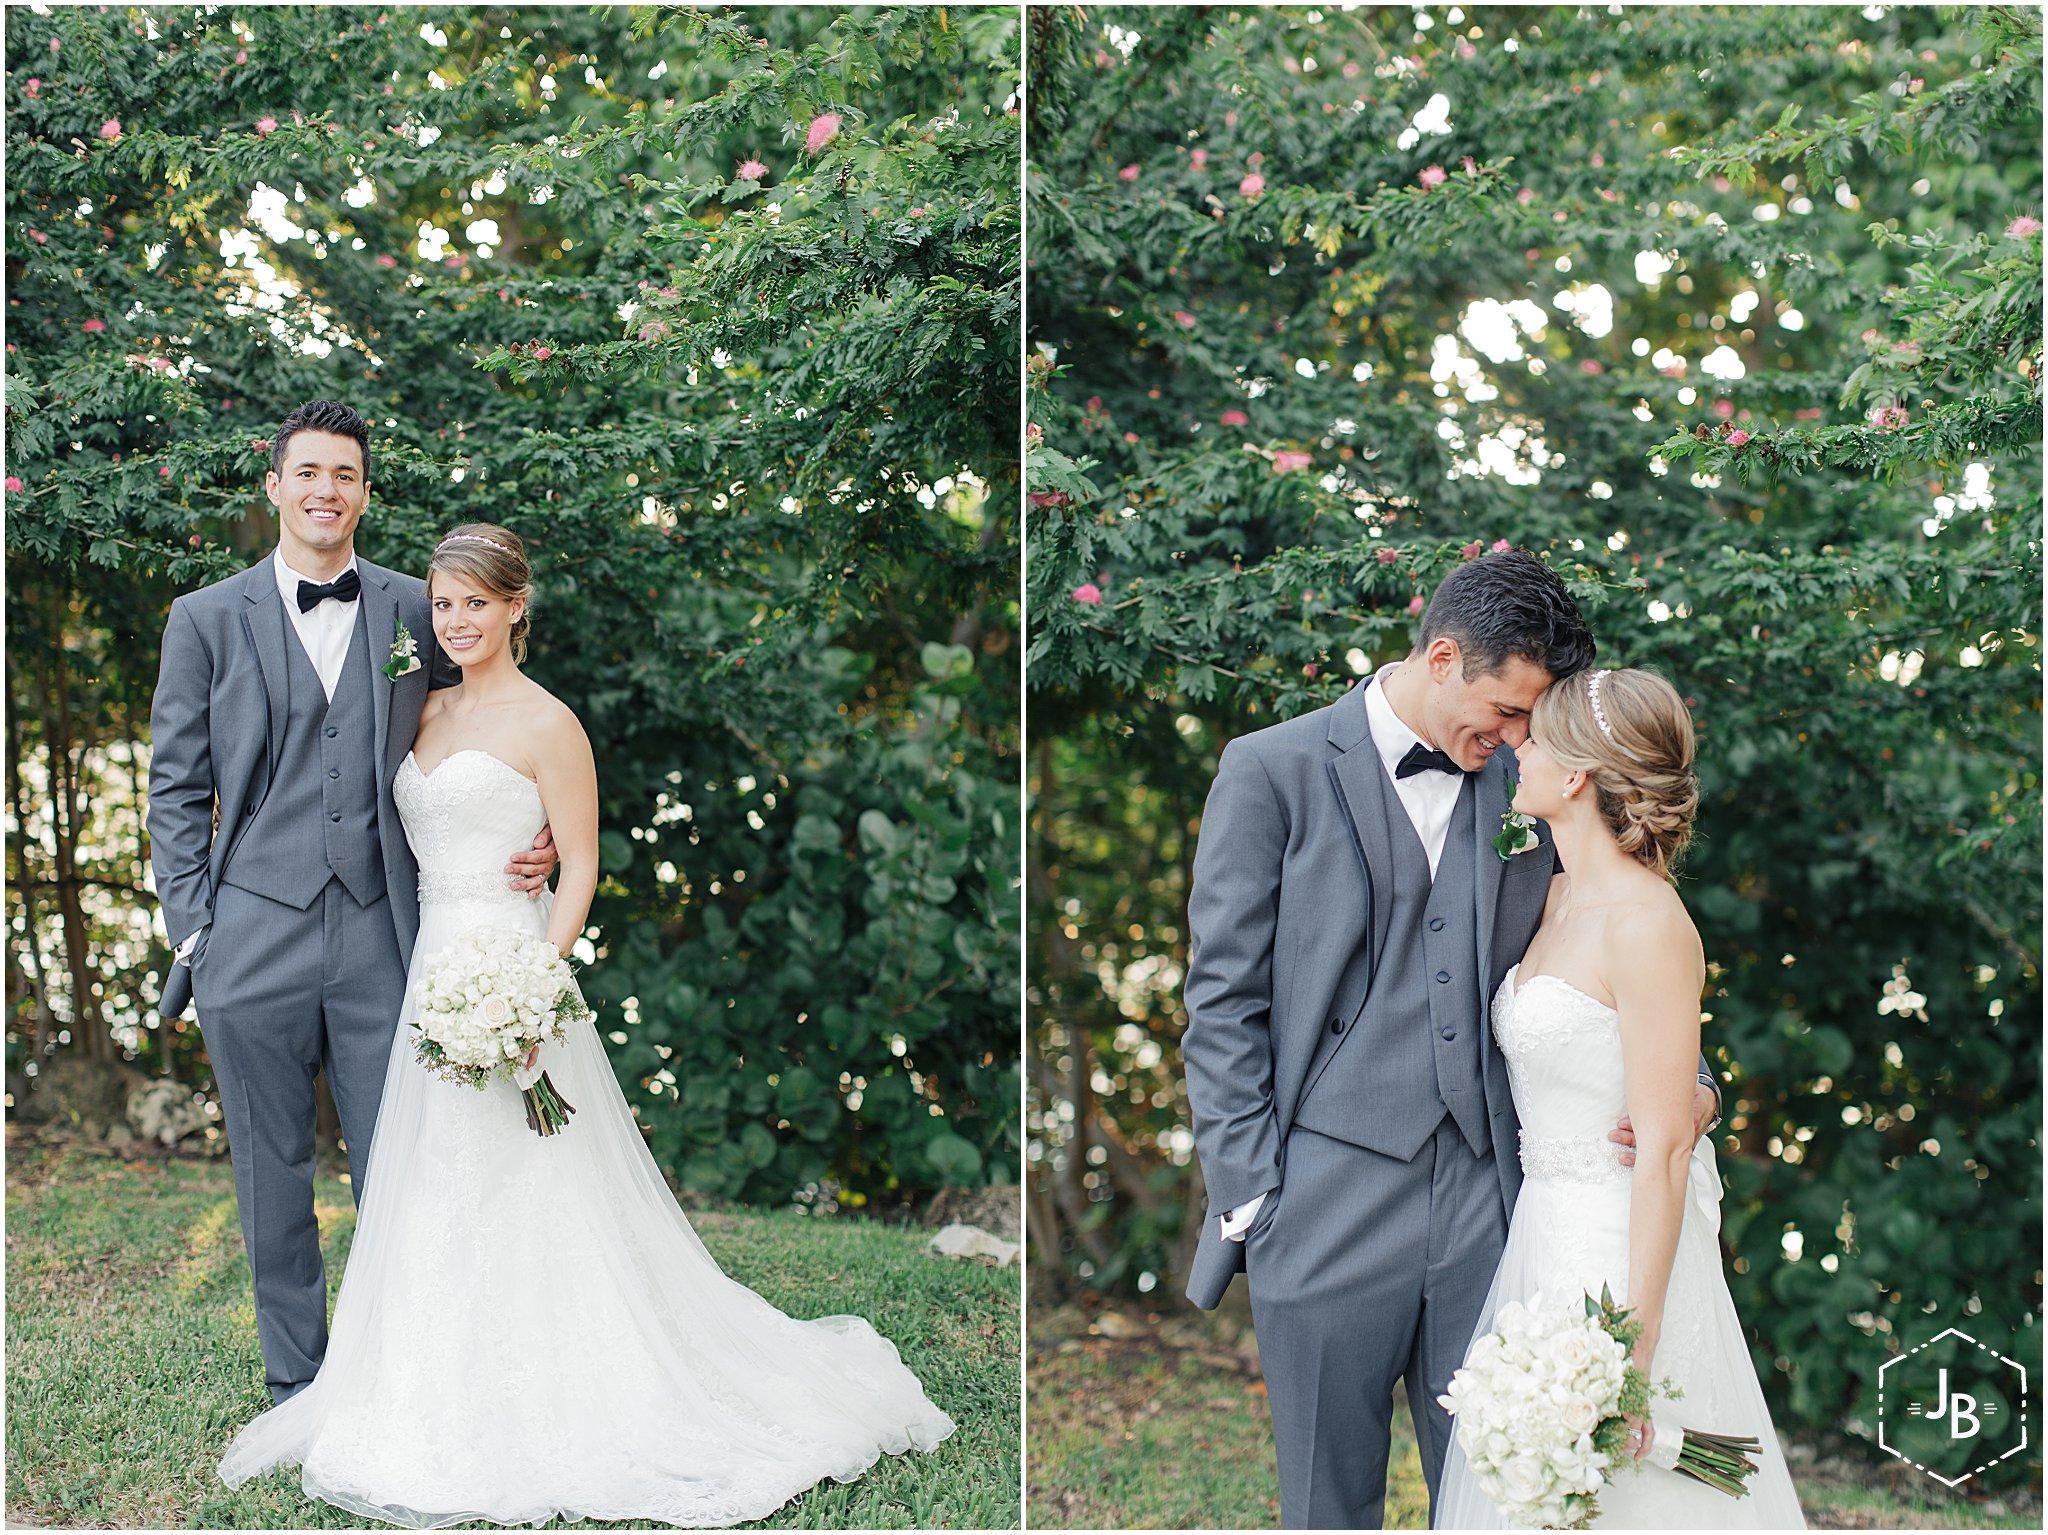 WeddingandEngagementFloridaPhotographer_0360.jpg